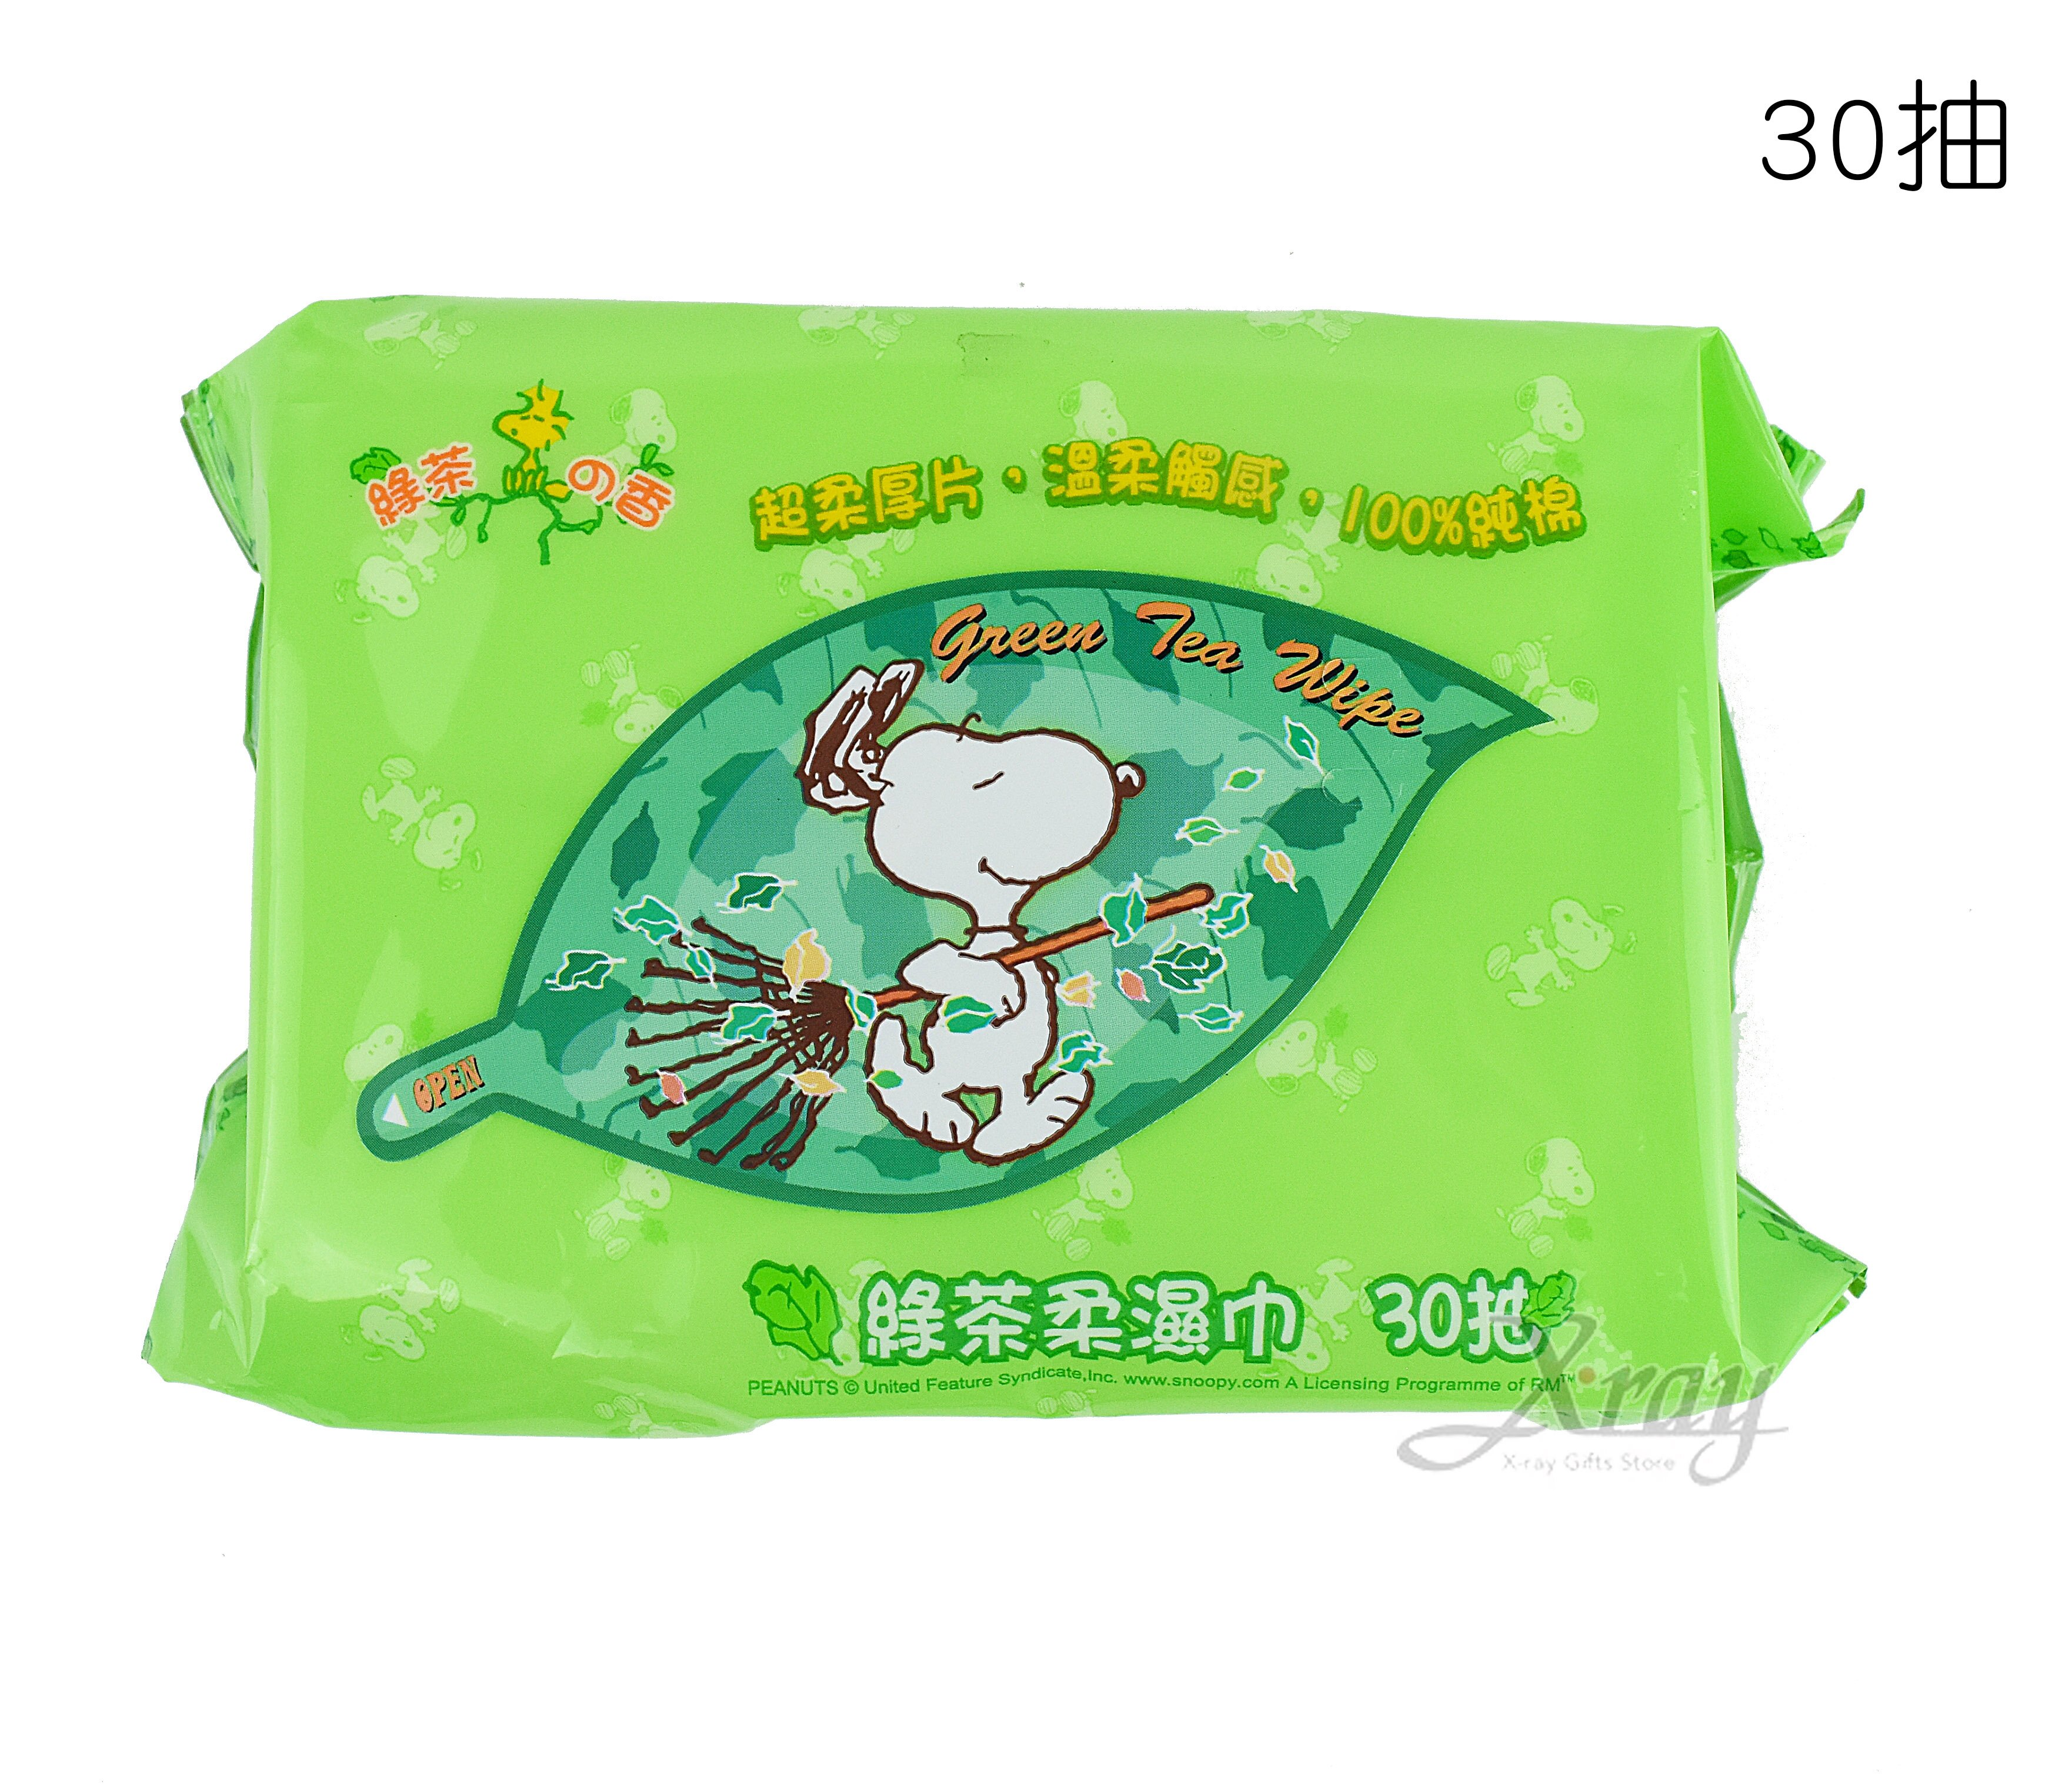 X射線【C931411】史奴比手濕巾-綠茶(30抽),Snoopy/濕紙巾/嬰兒濕紙巾/衛生紙/面紙/經期用濕紙巾/隨身包